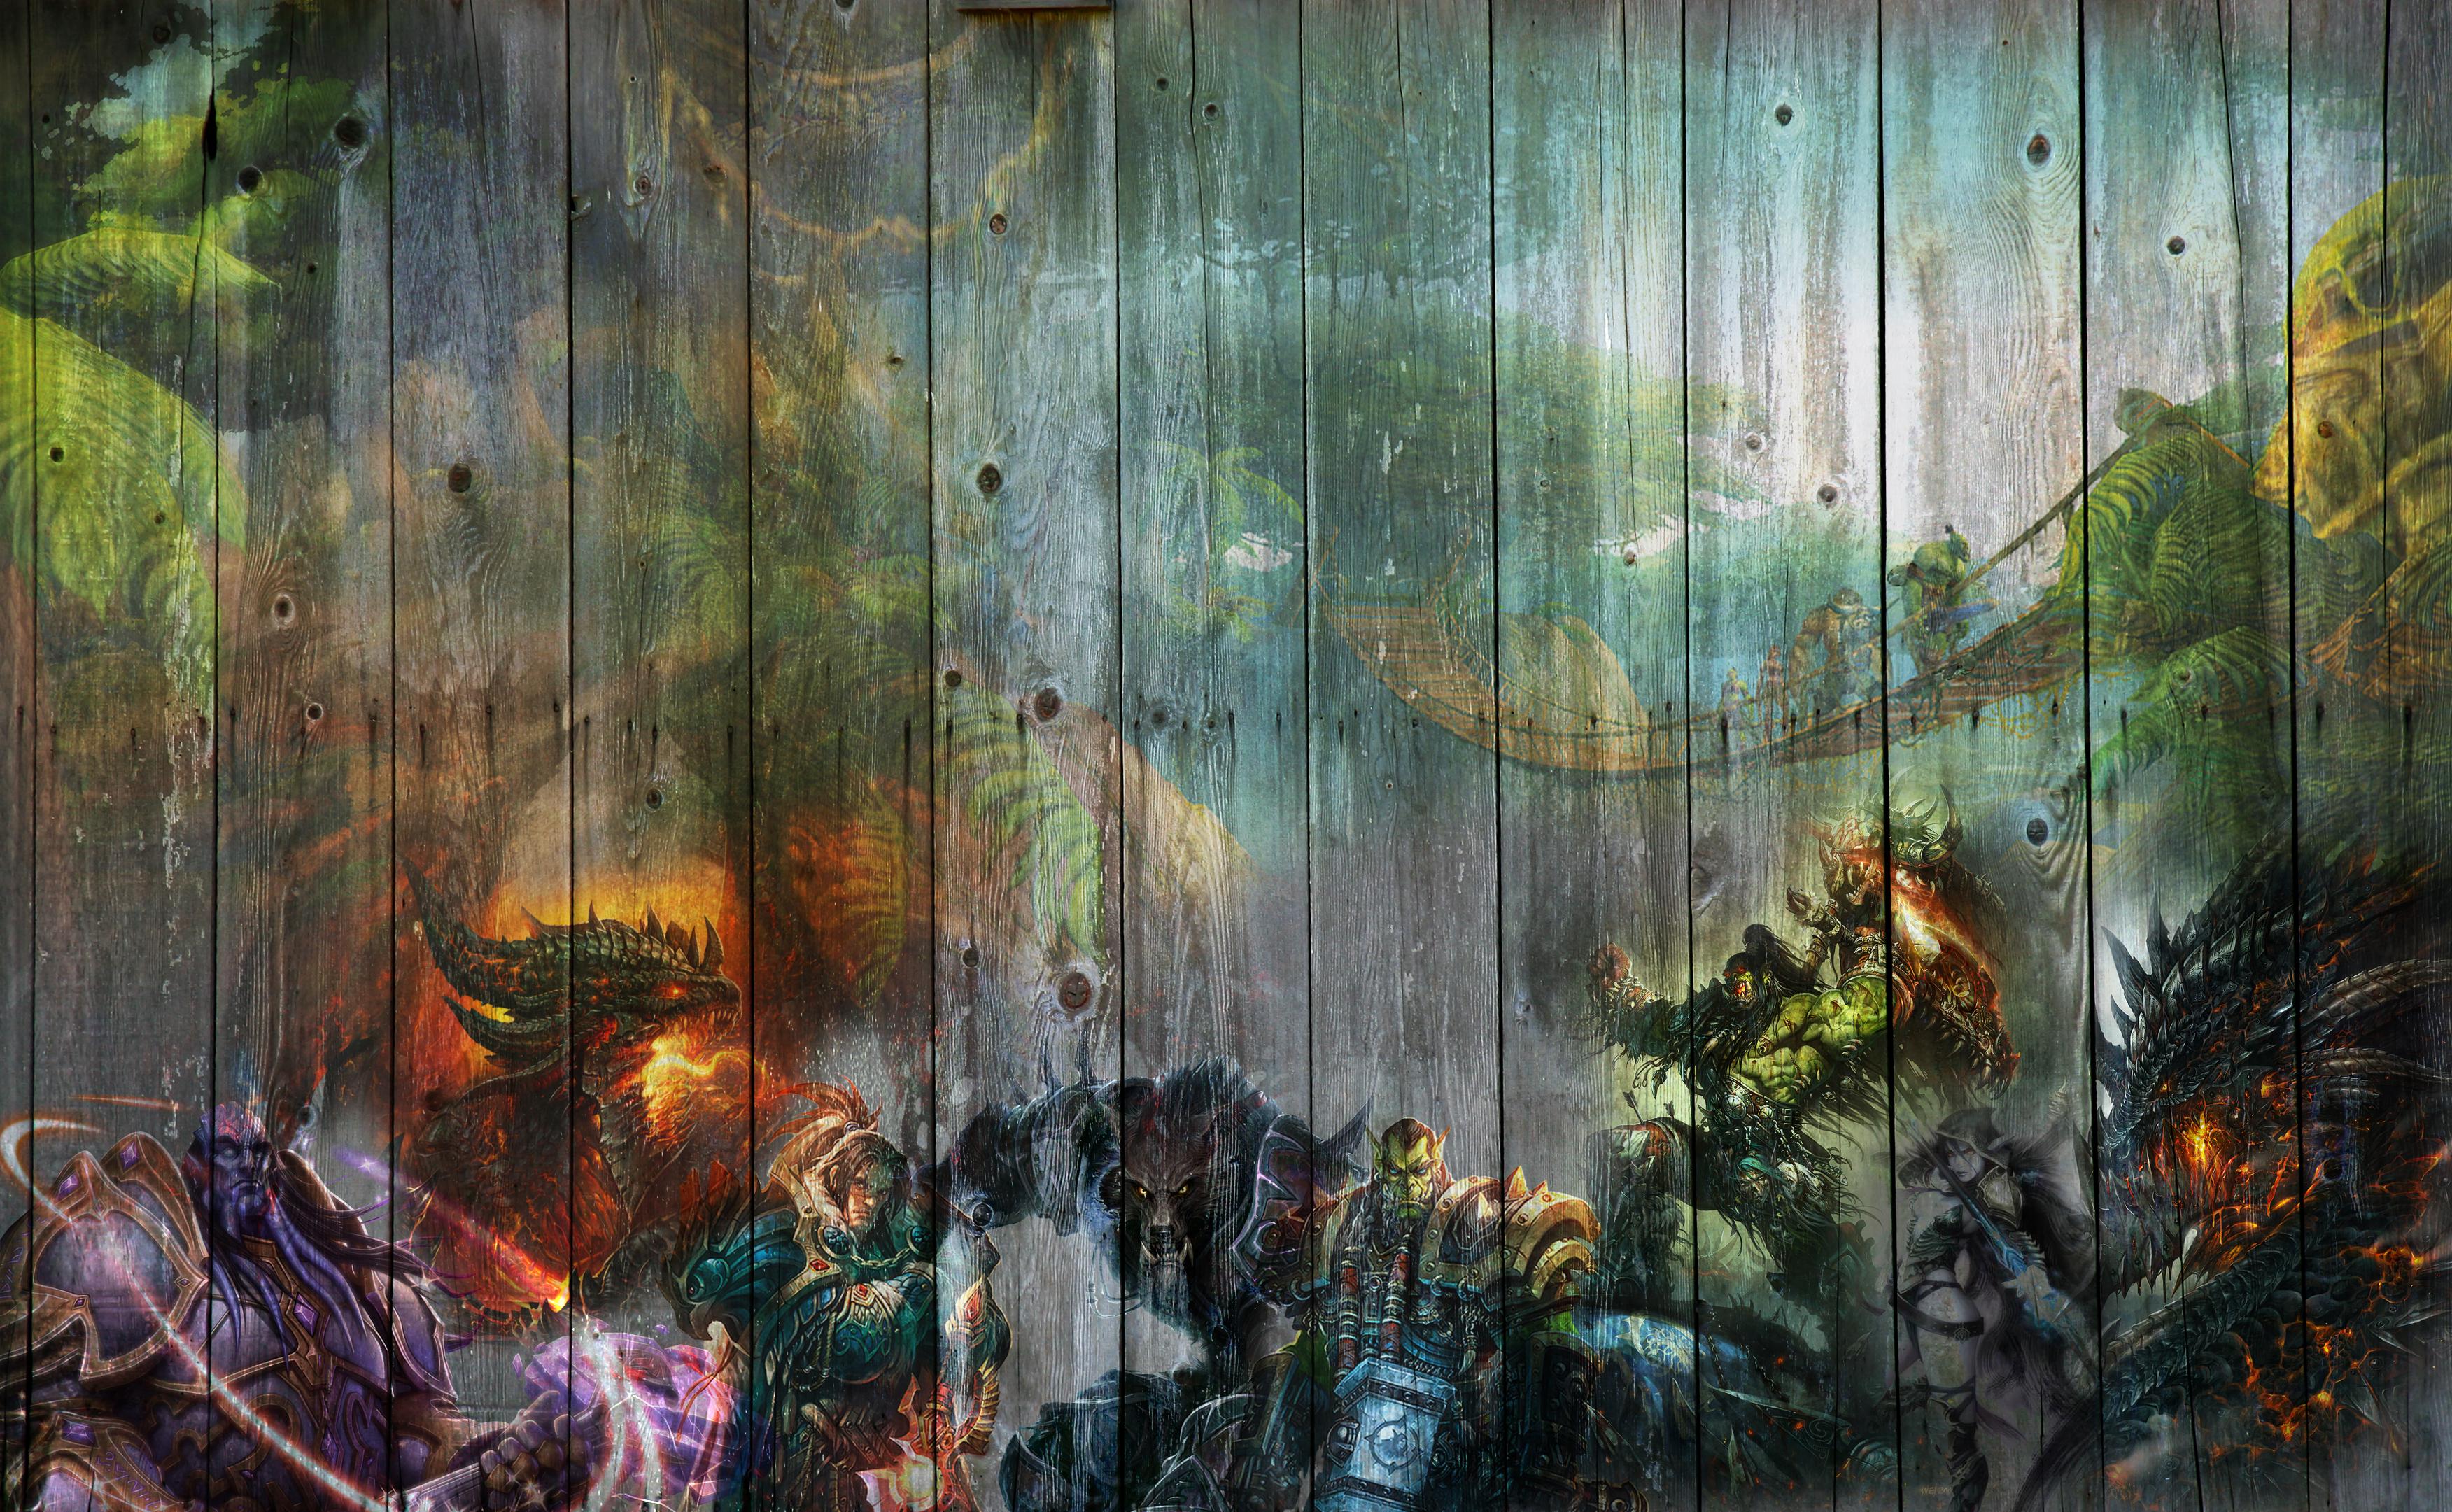 World Of Warcraft Wallpaper By Arixev On Deviantart